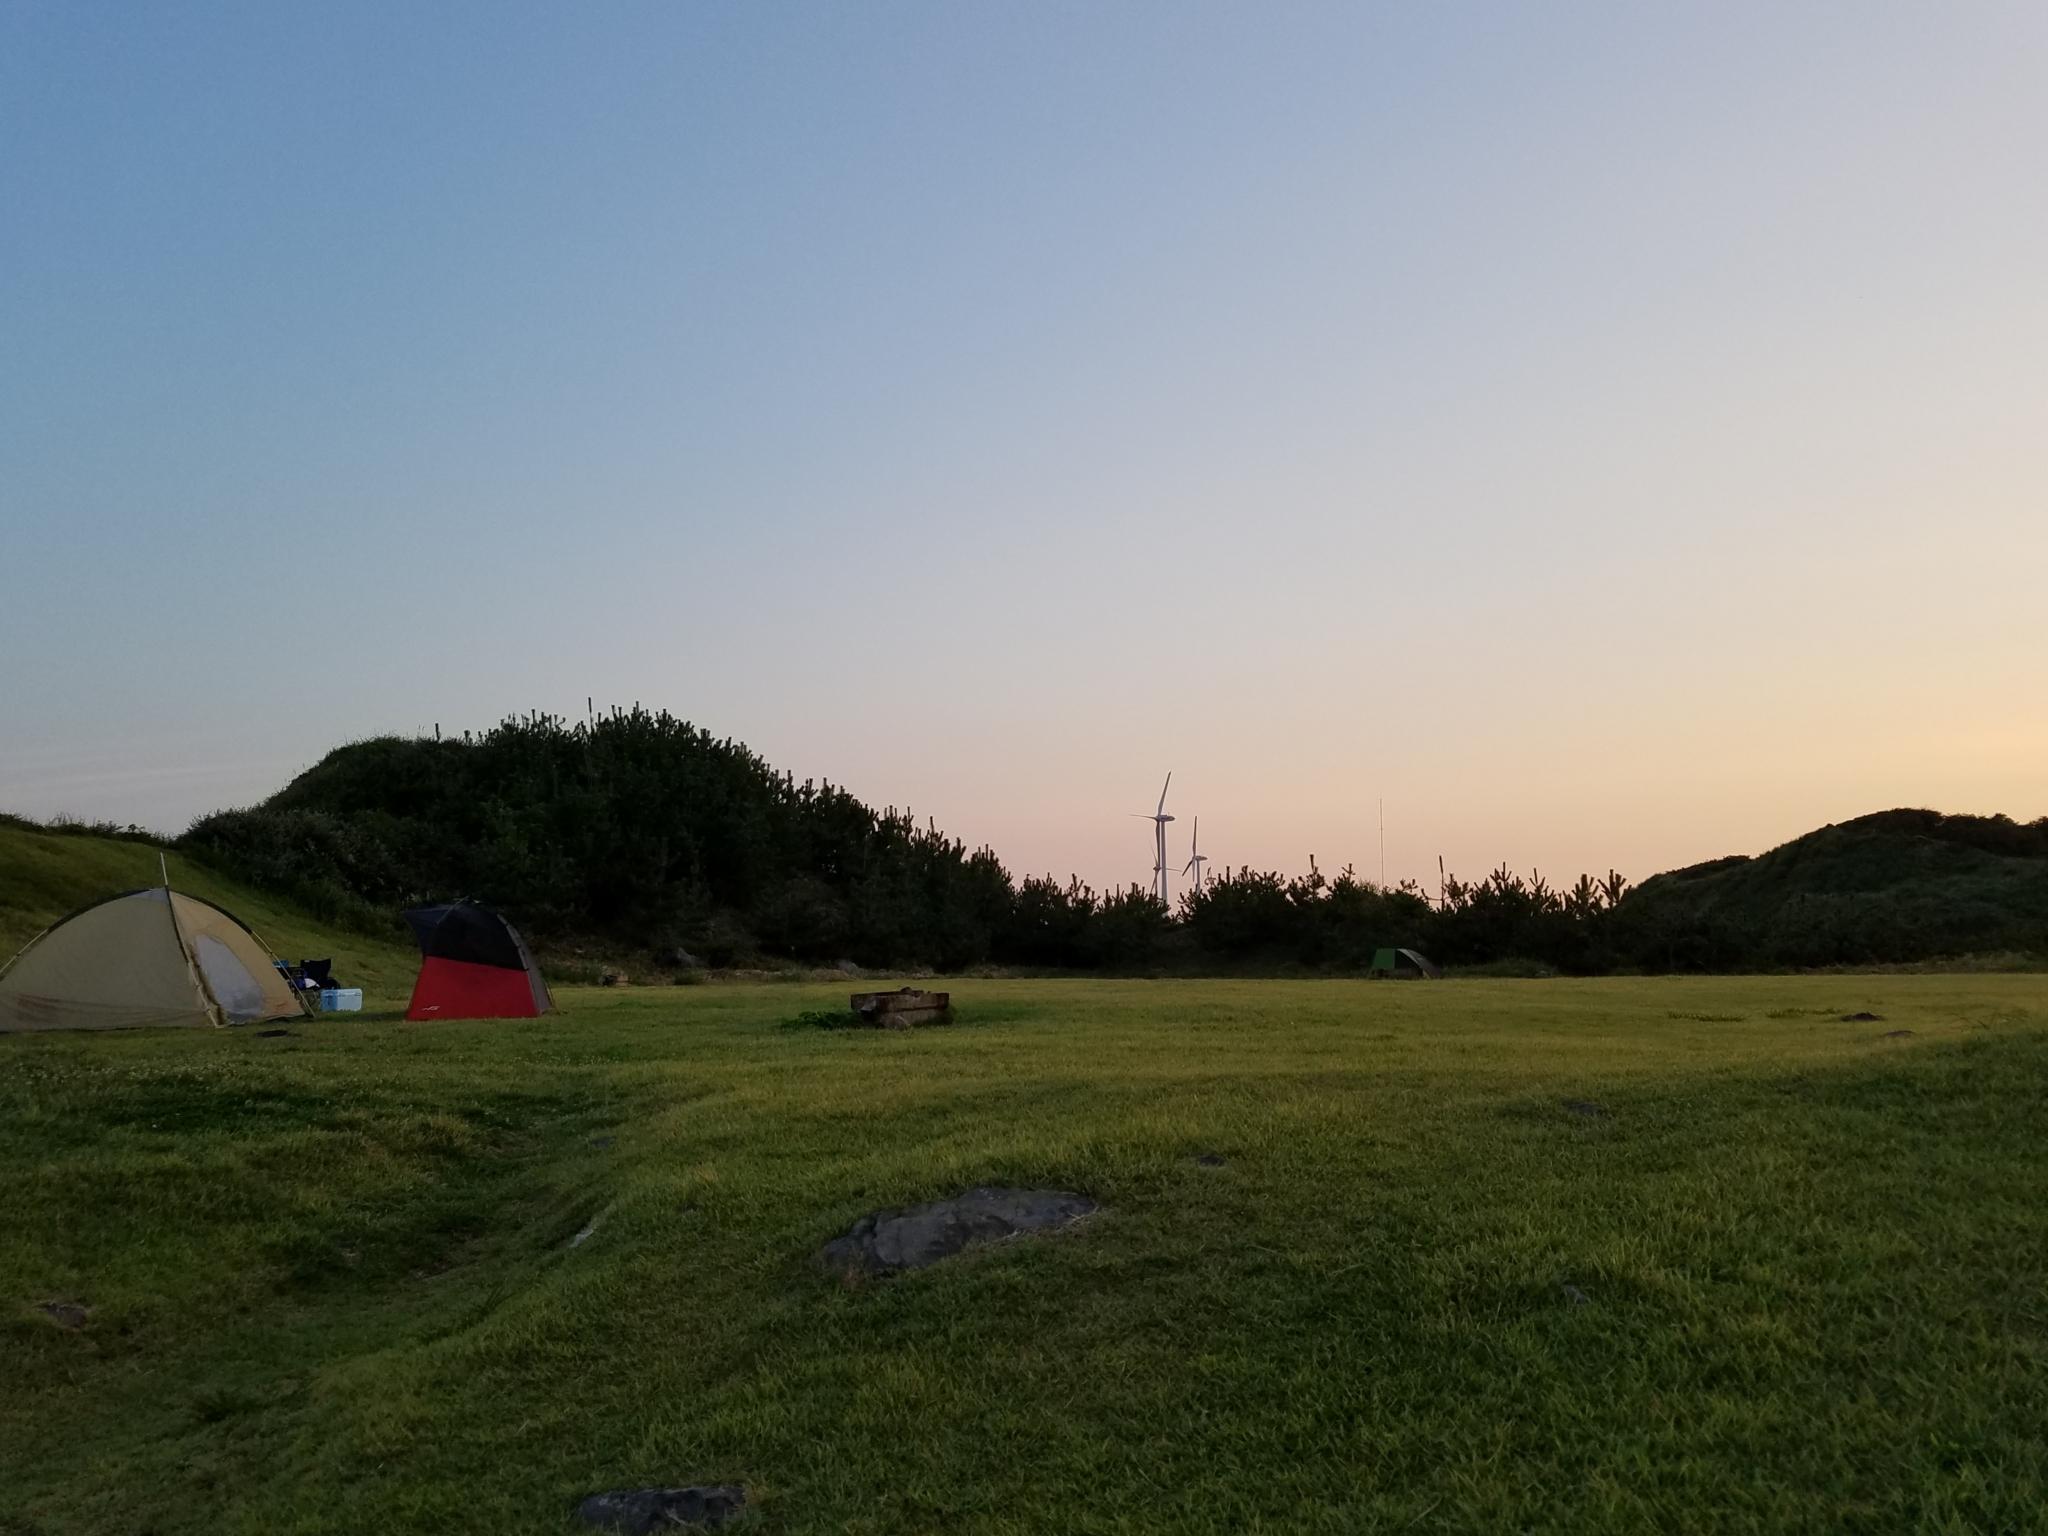 f:id:ToshUeno:20160903052405j:plain